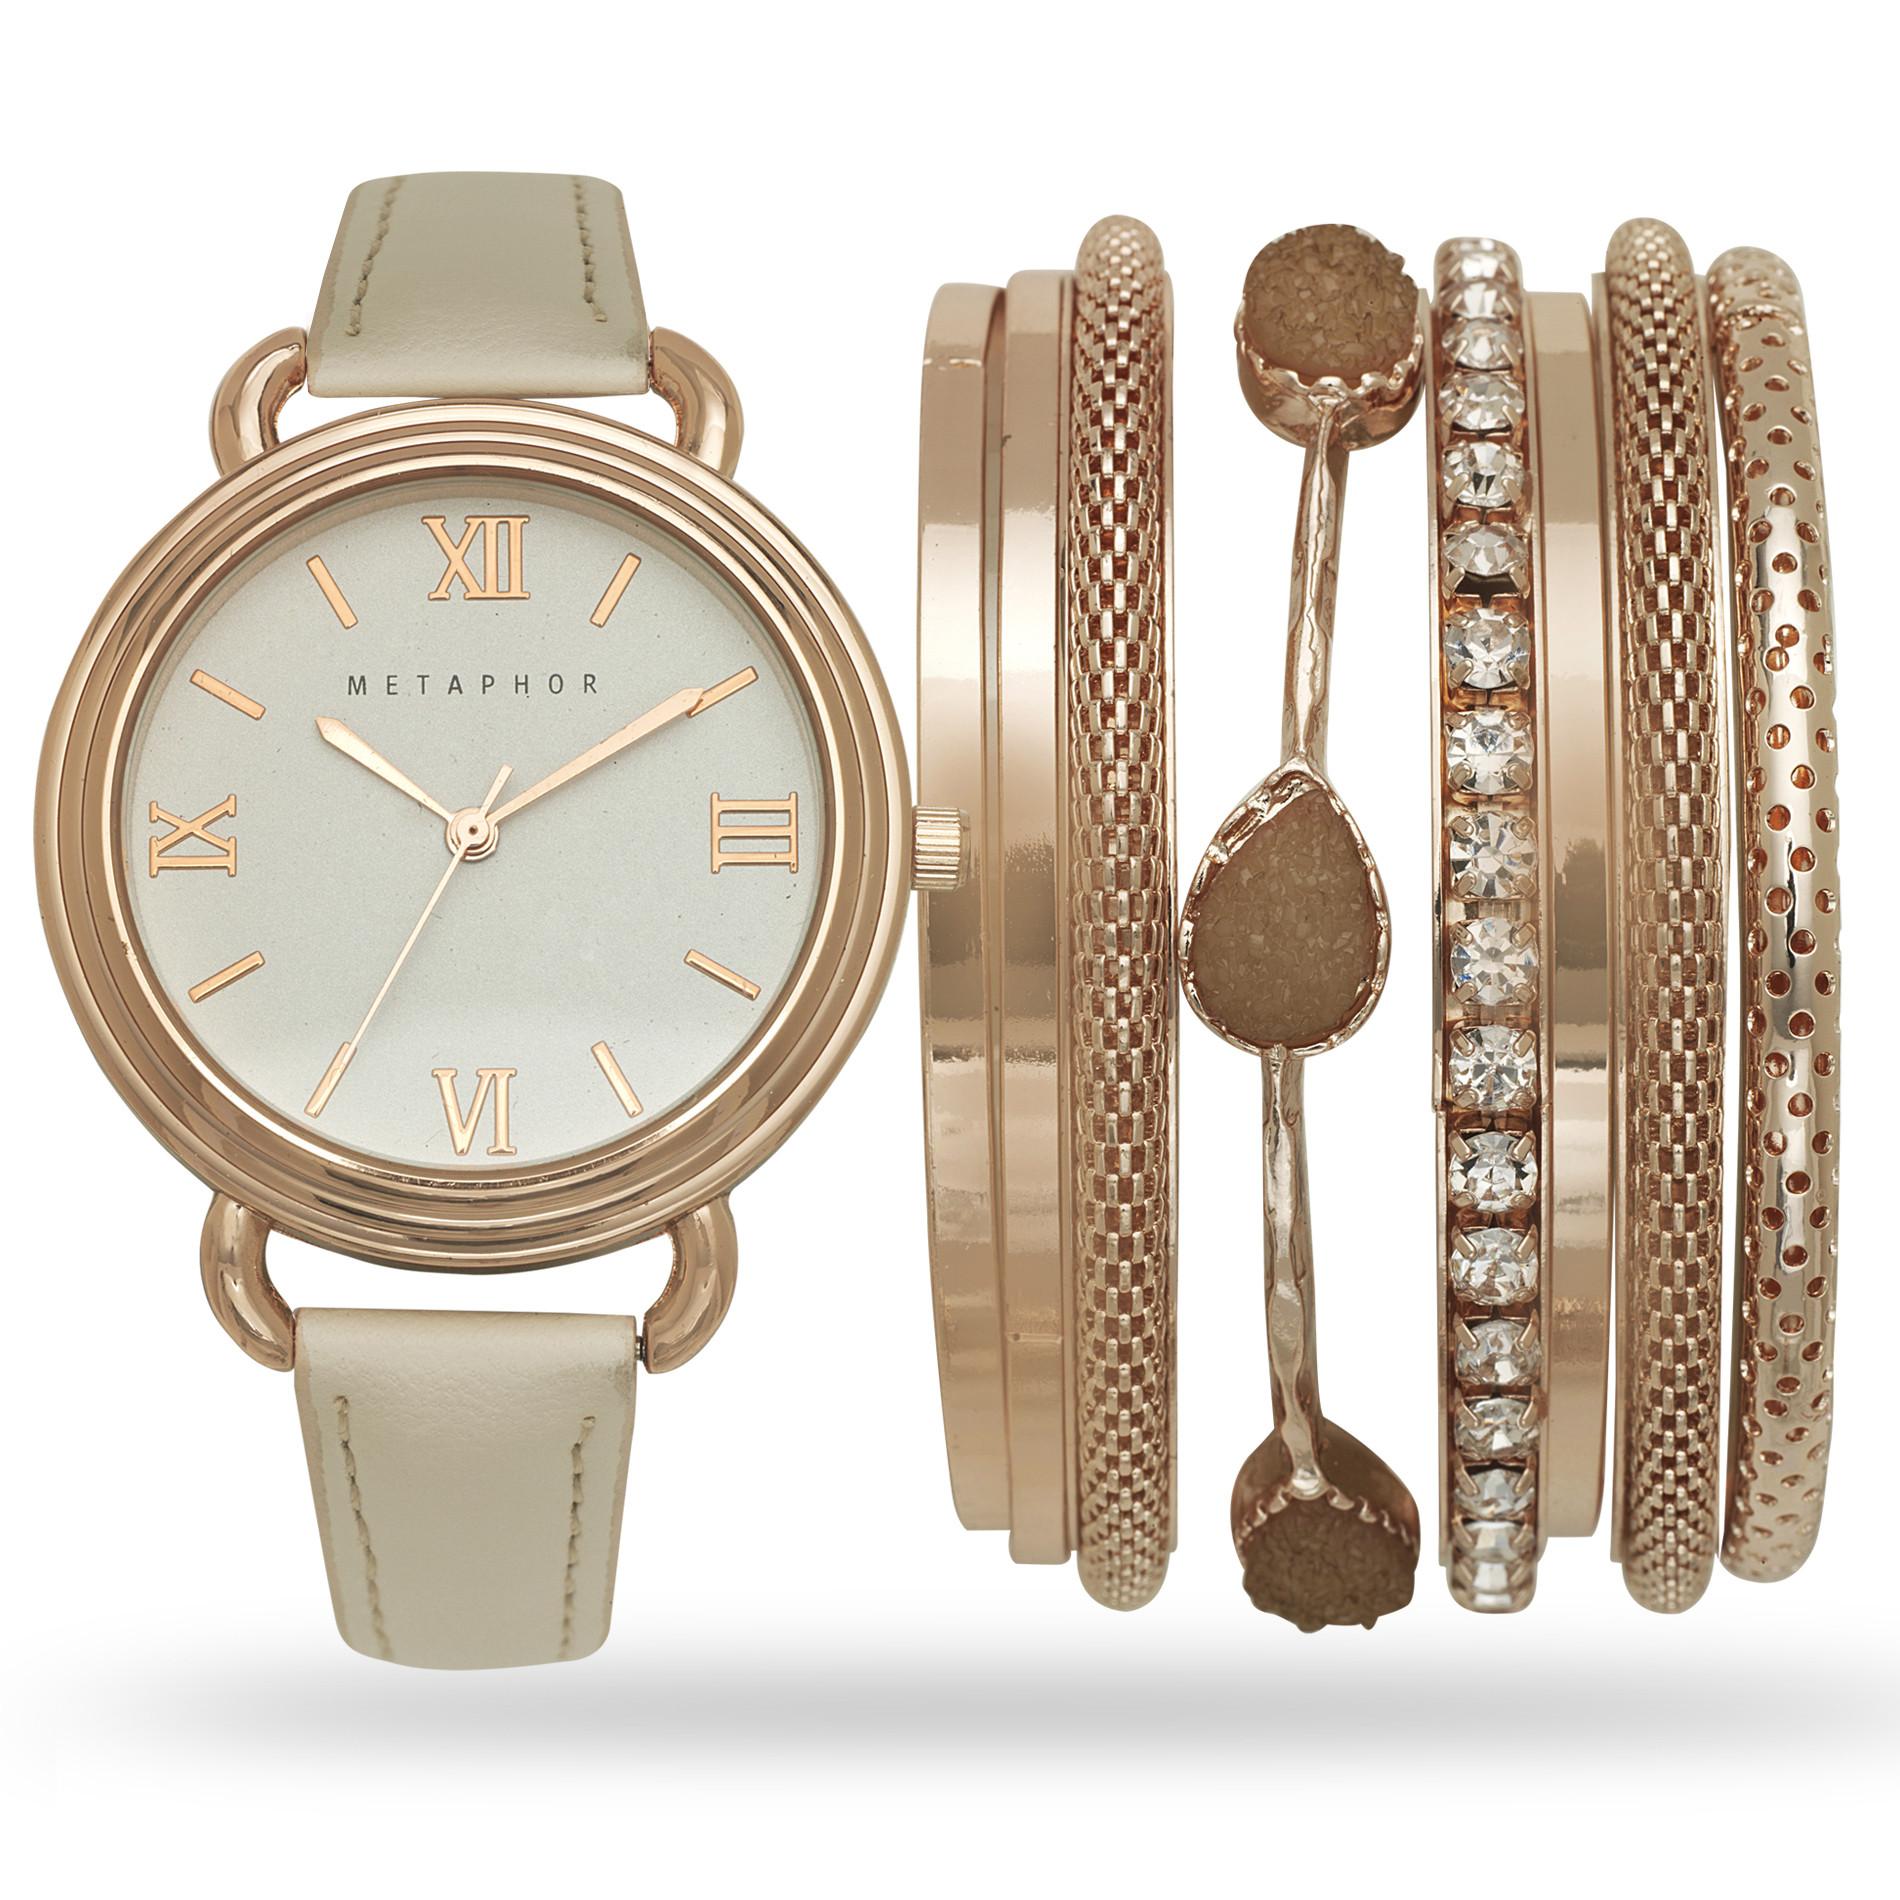 Bracelet And Watch Set  Metaphor La s Rose Gold Watch and Bracelet Set Jewelry